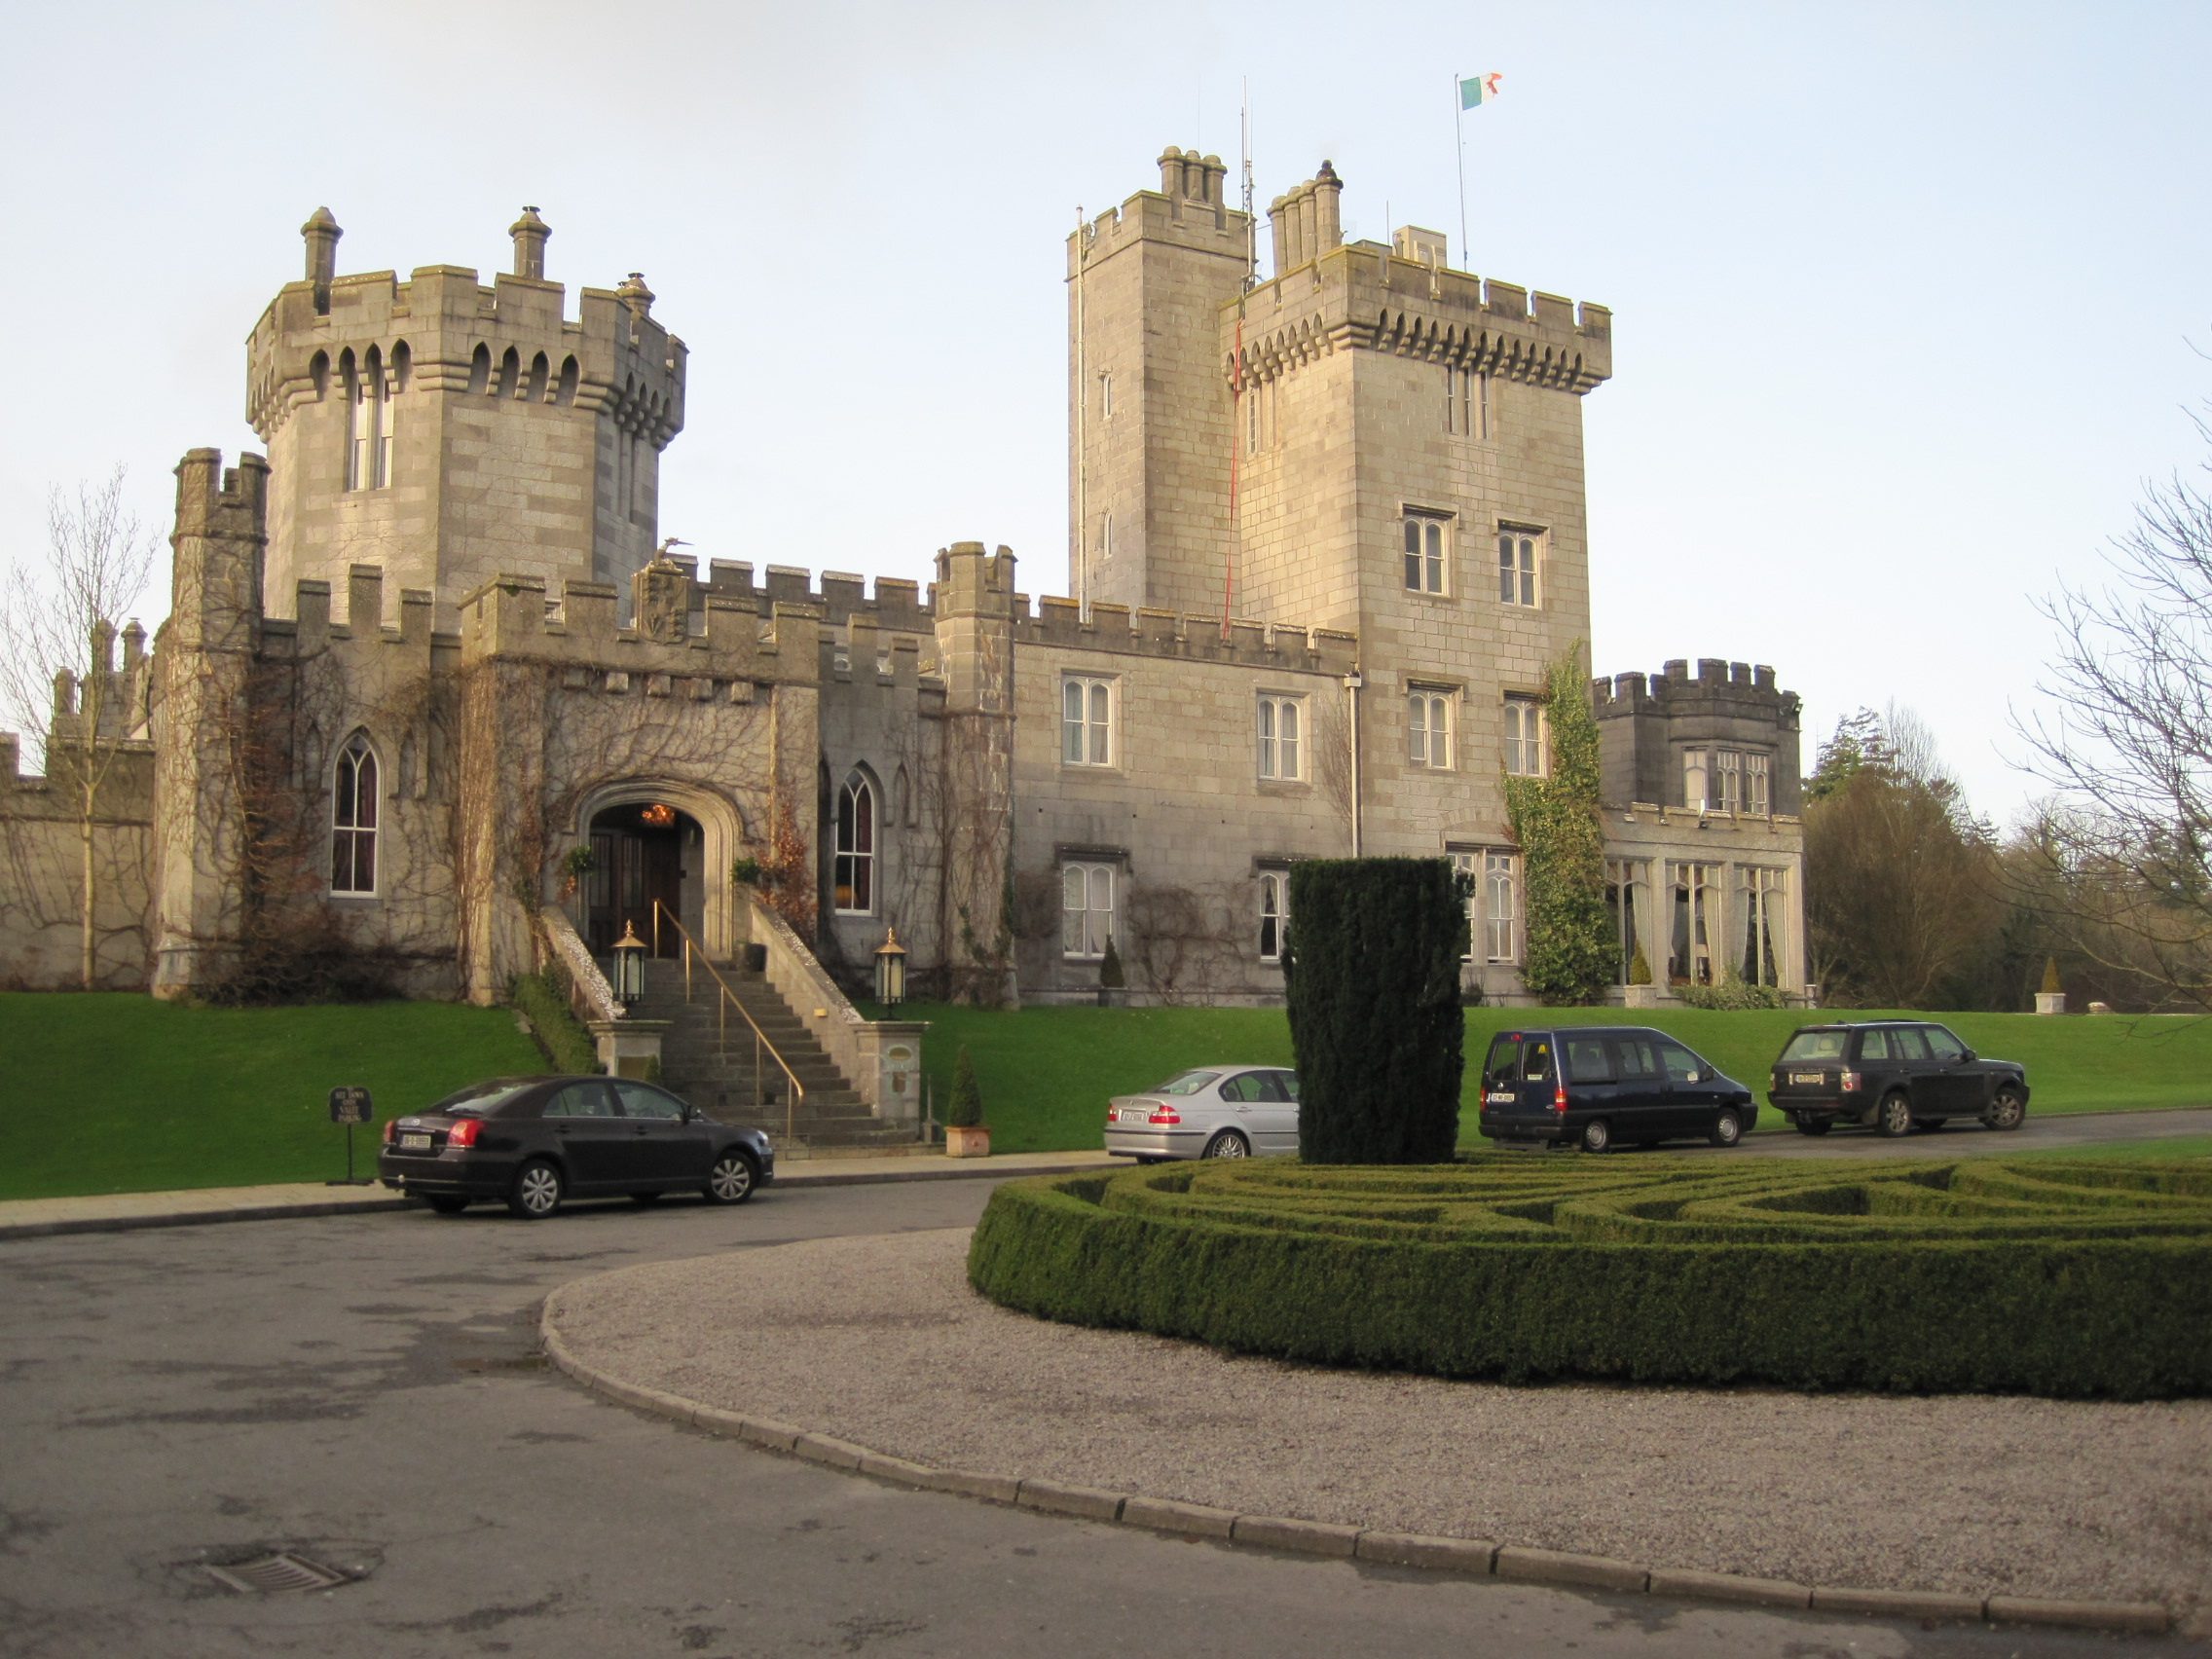 Ballyhaunis, Co. Mayo in the West of Ireland | kurikku.co.uk